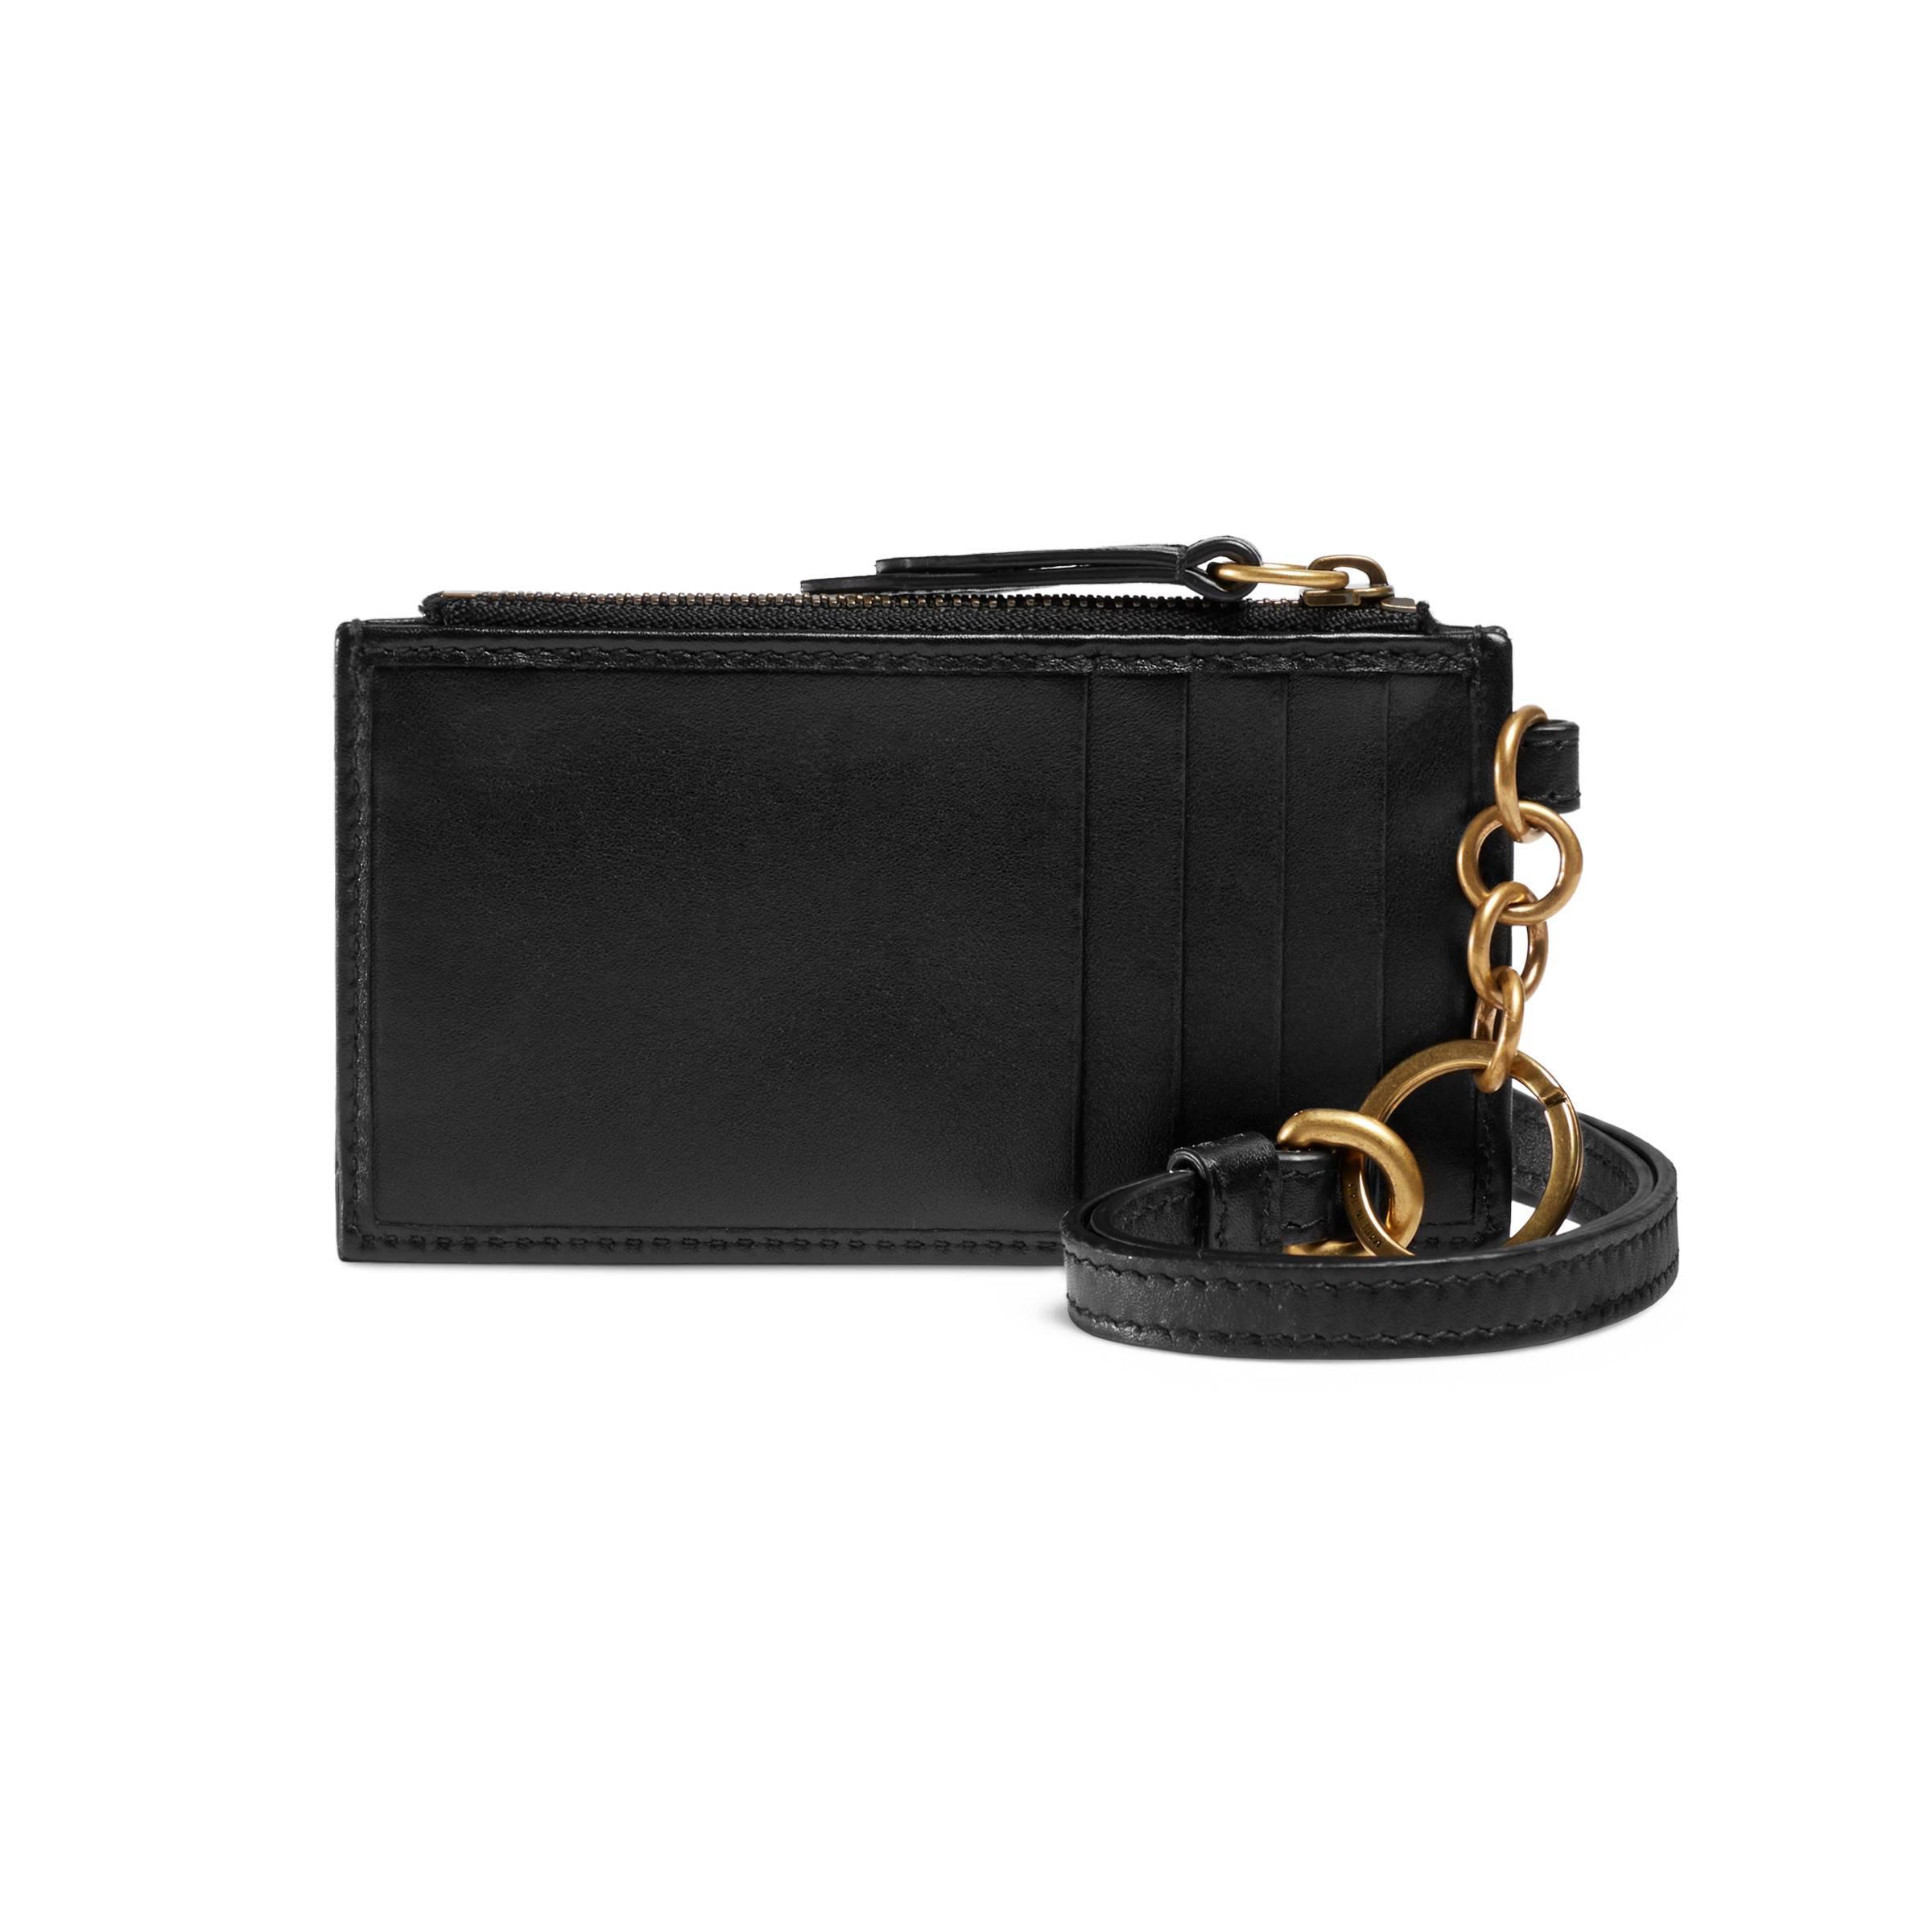 21a1493d2678 Gucci - Black GG Marmont Card Case - Lyst. View fullscreen